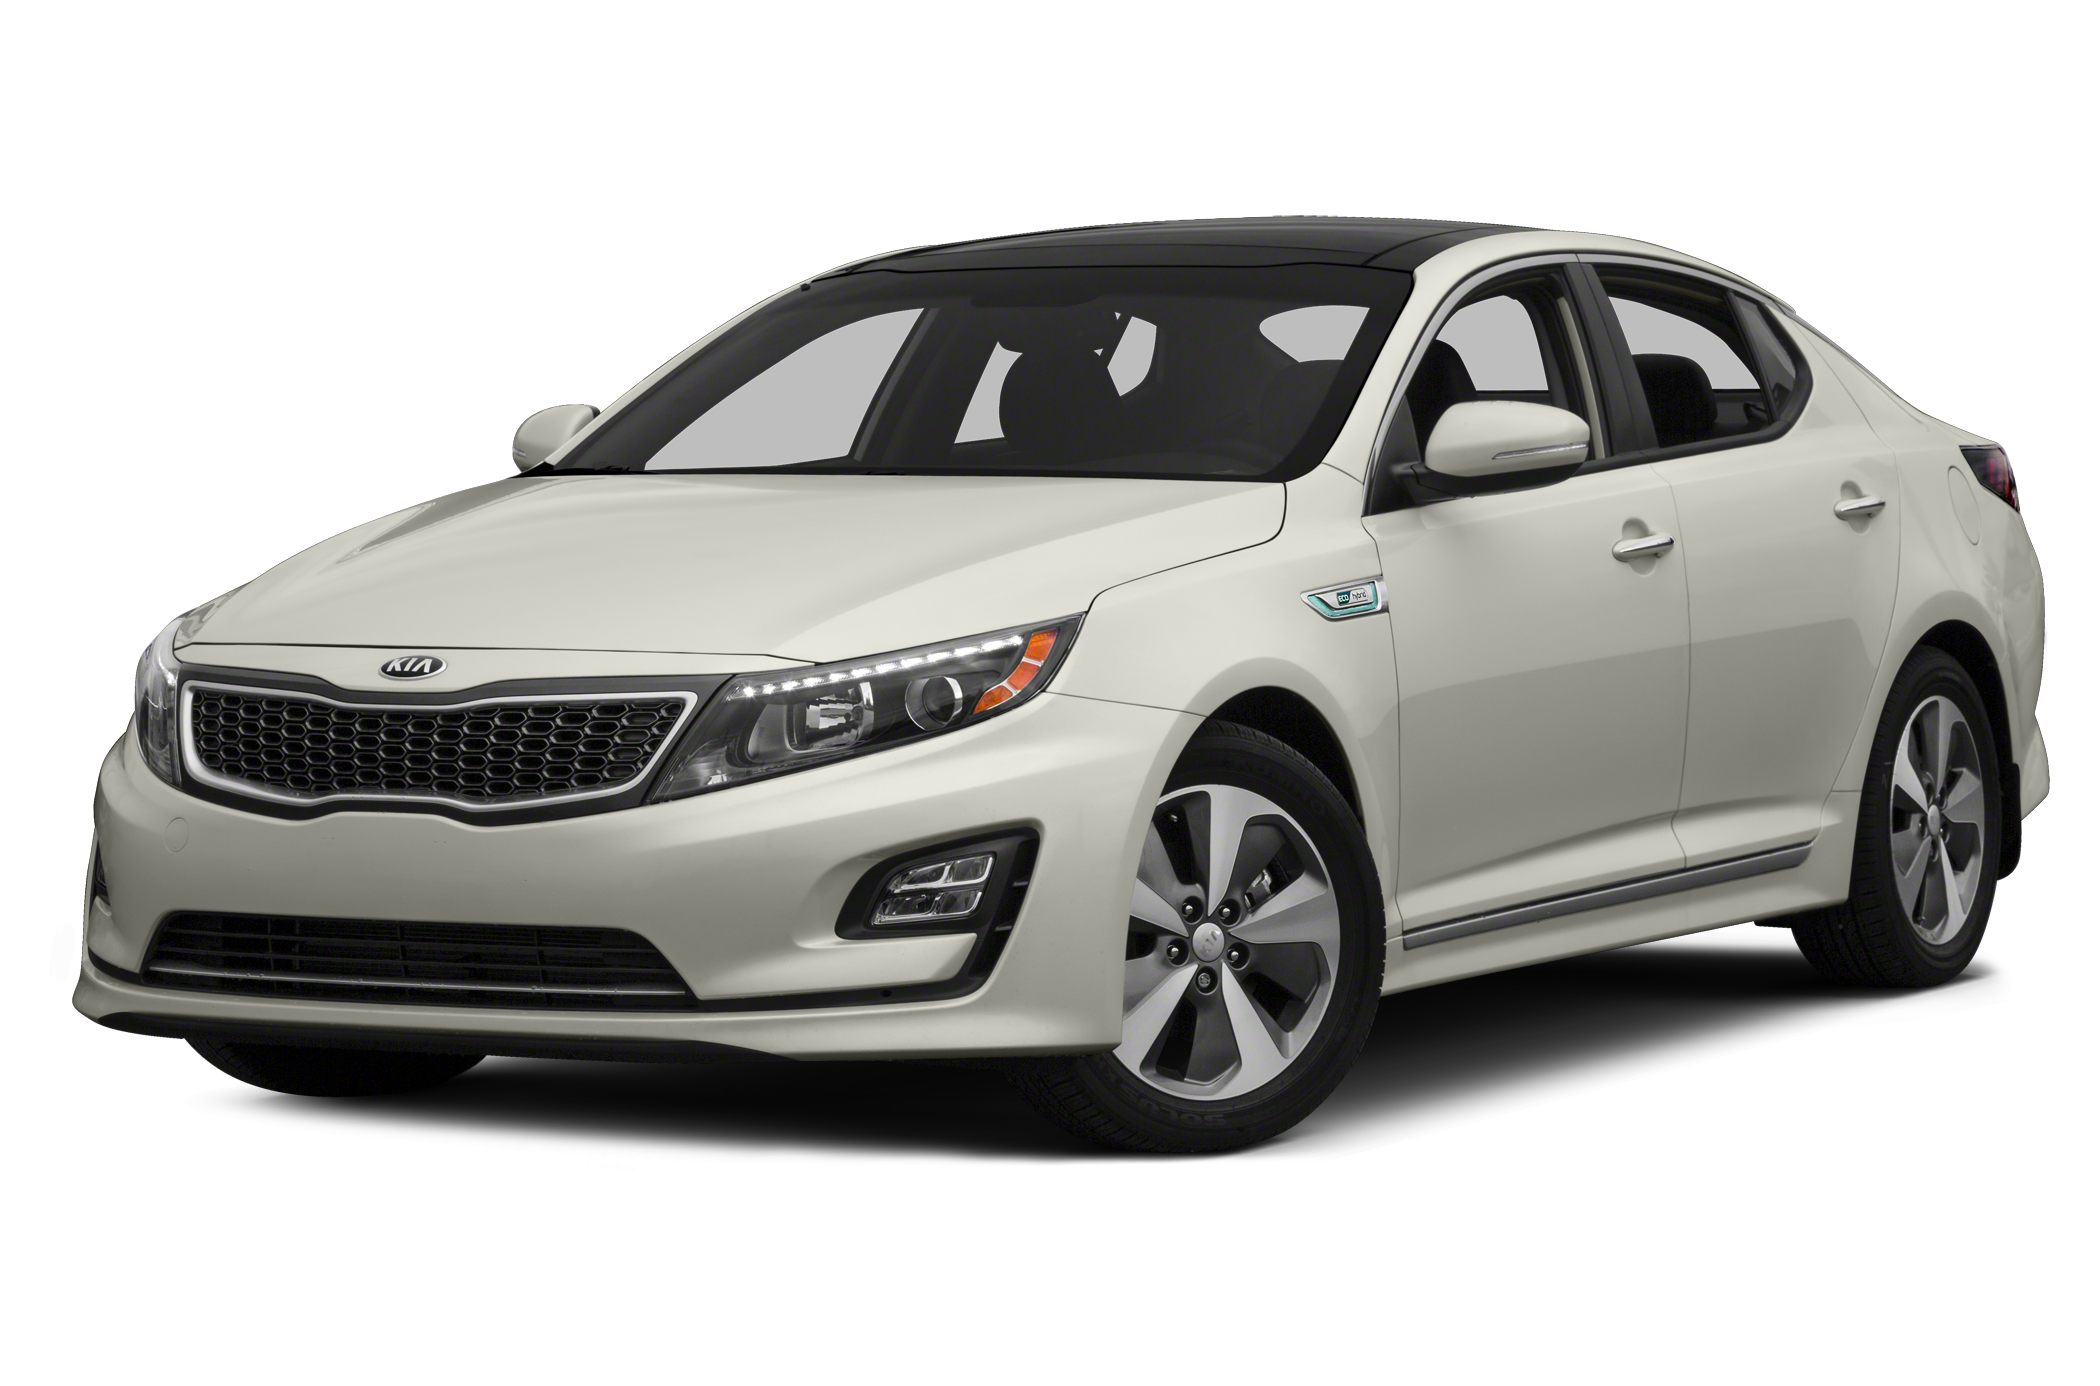 Kia Dealers Nj News Of New Car Release